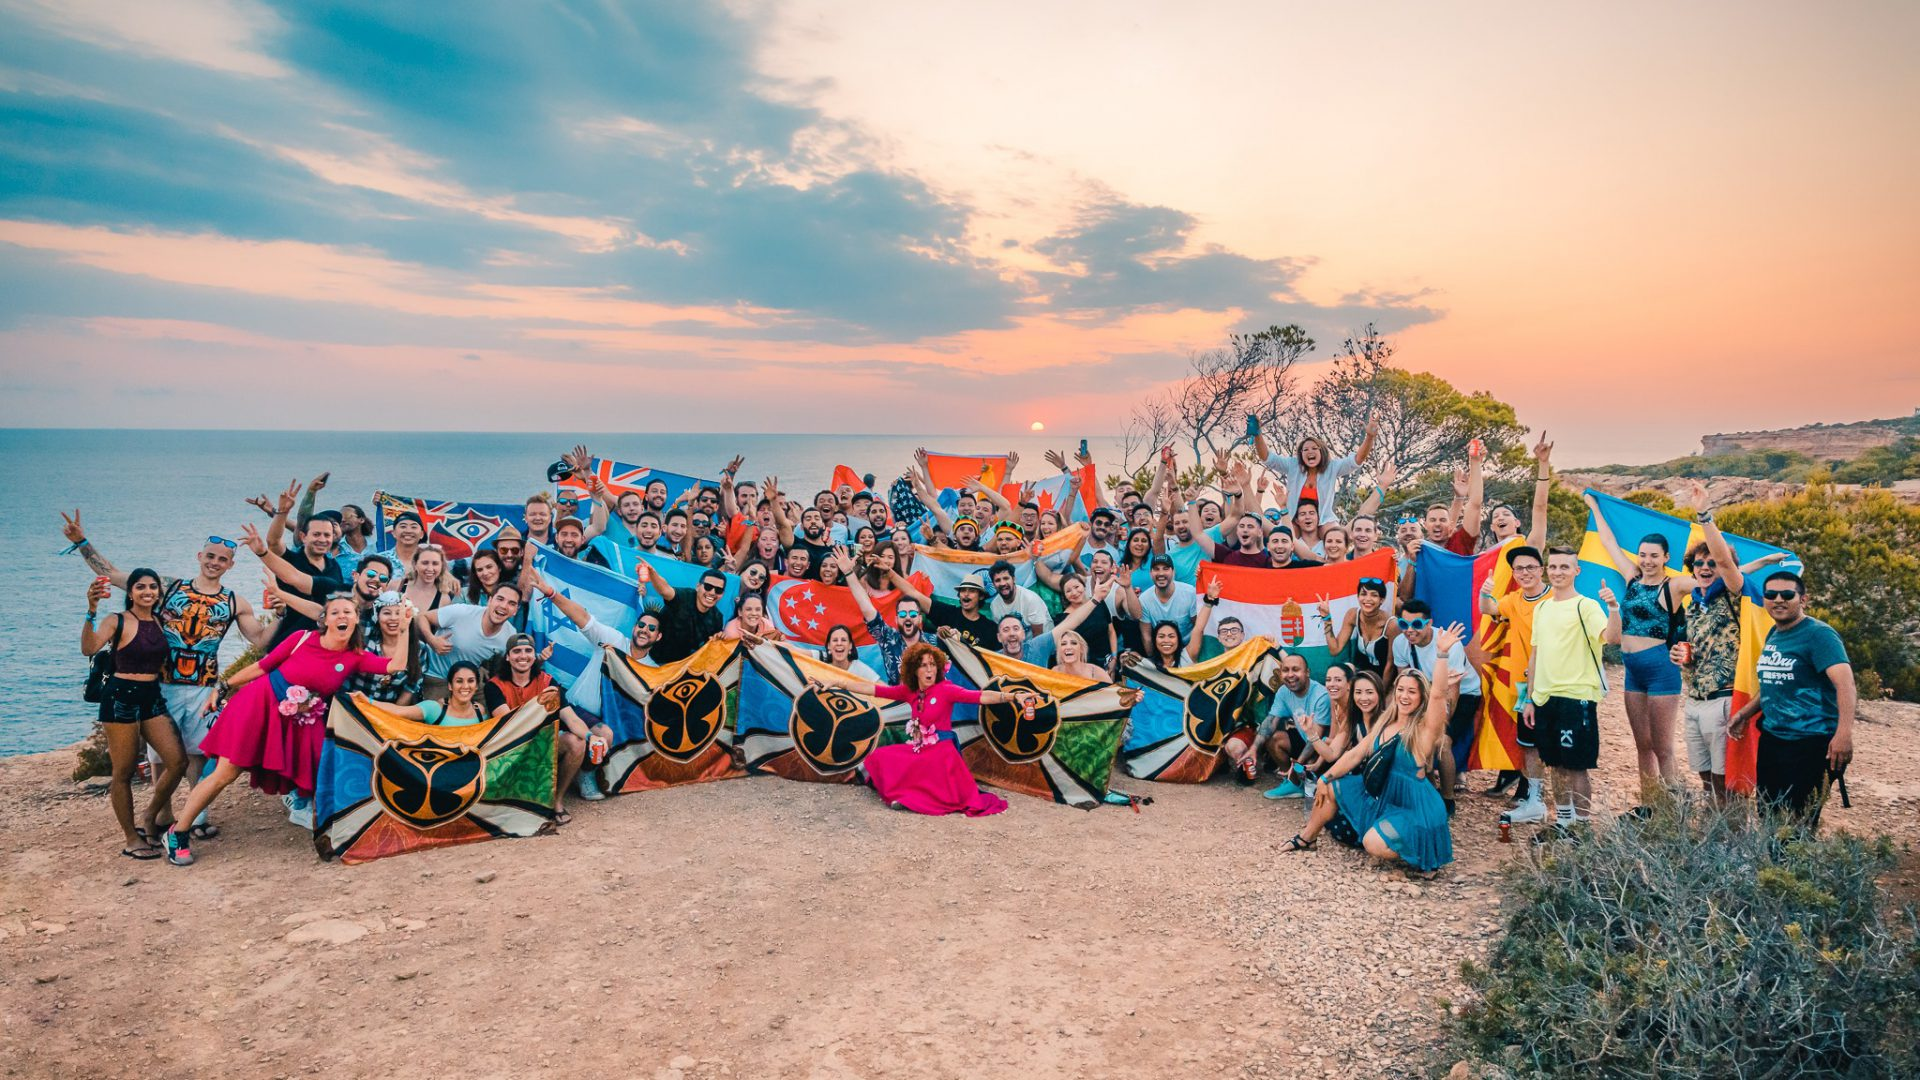 Ibiza - Discover Europe by Tomorrowland